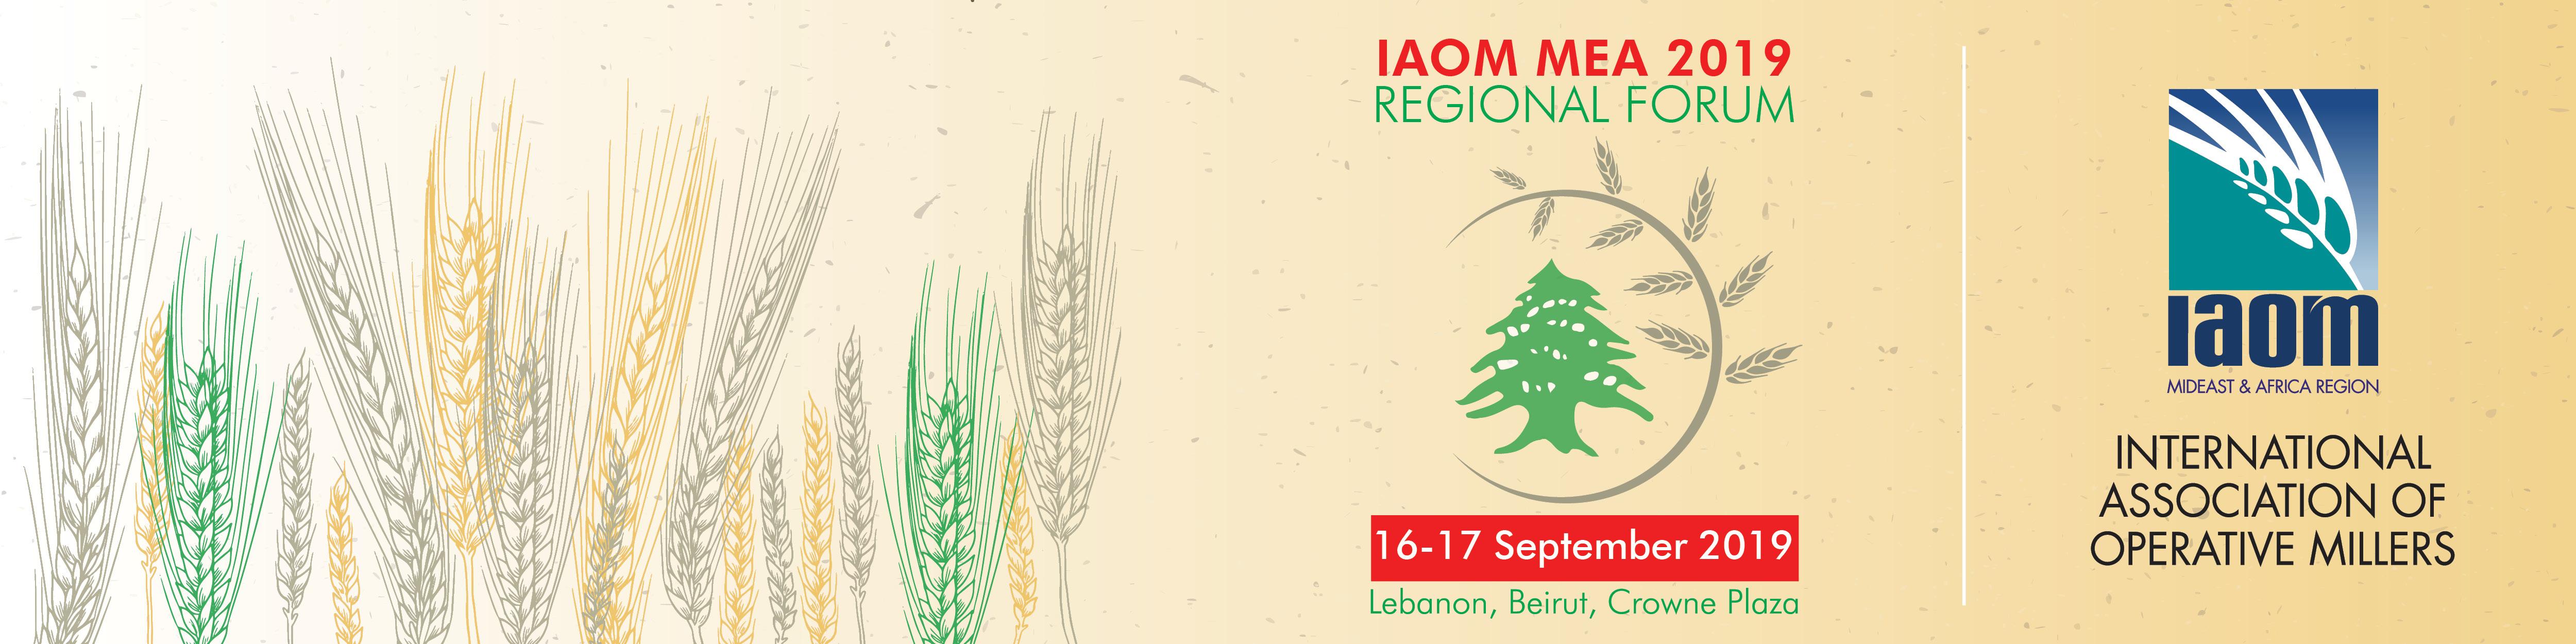 IAOM MEA 2019 Regional Forum - Lebanon